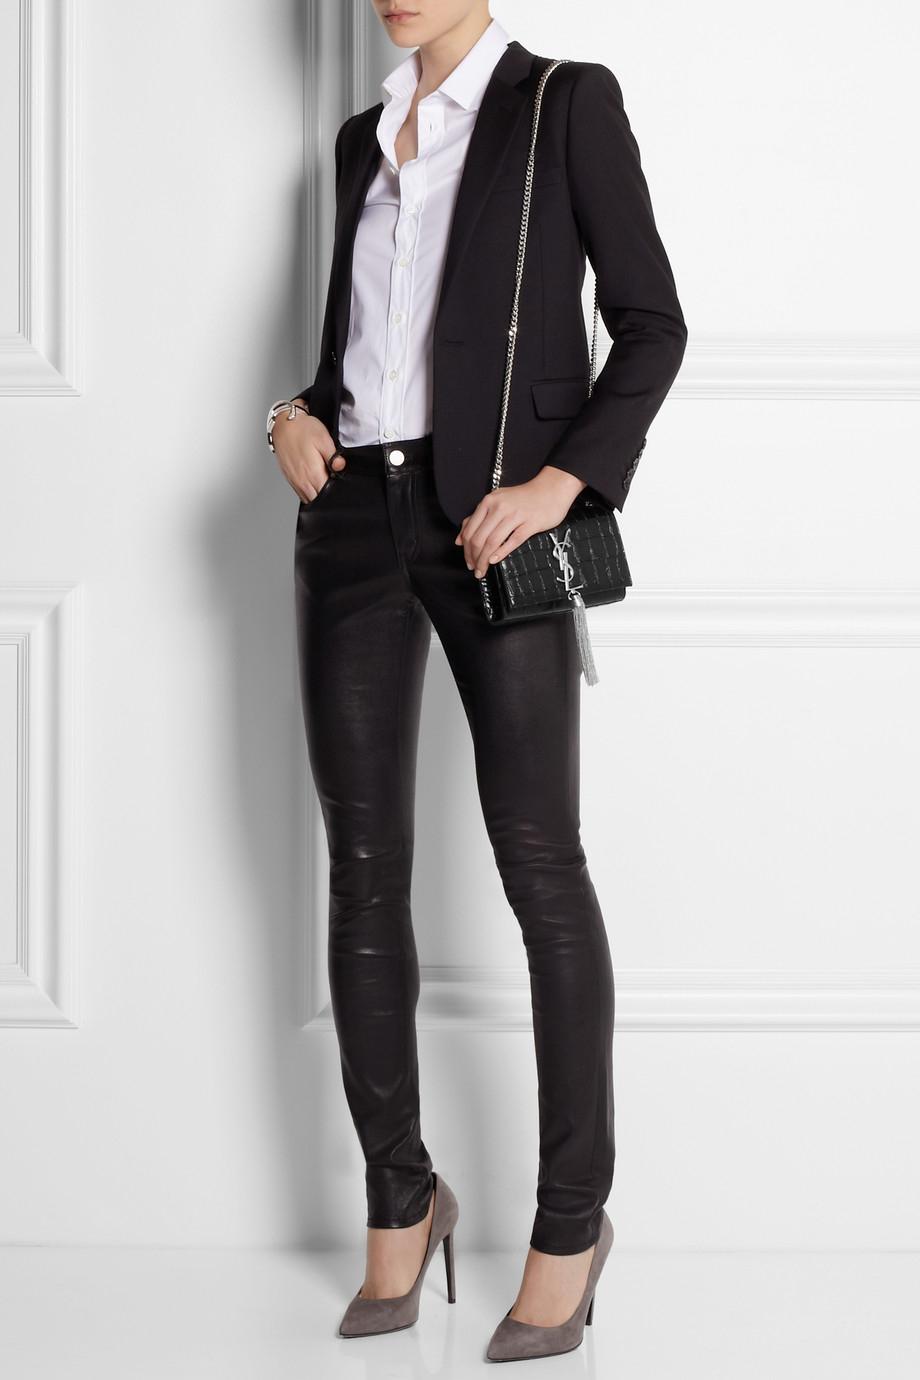 Lyst - Saint Laurent Monogramme Croceffect Leather Shoulder Bag in Black c5e872b169f4b